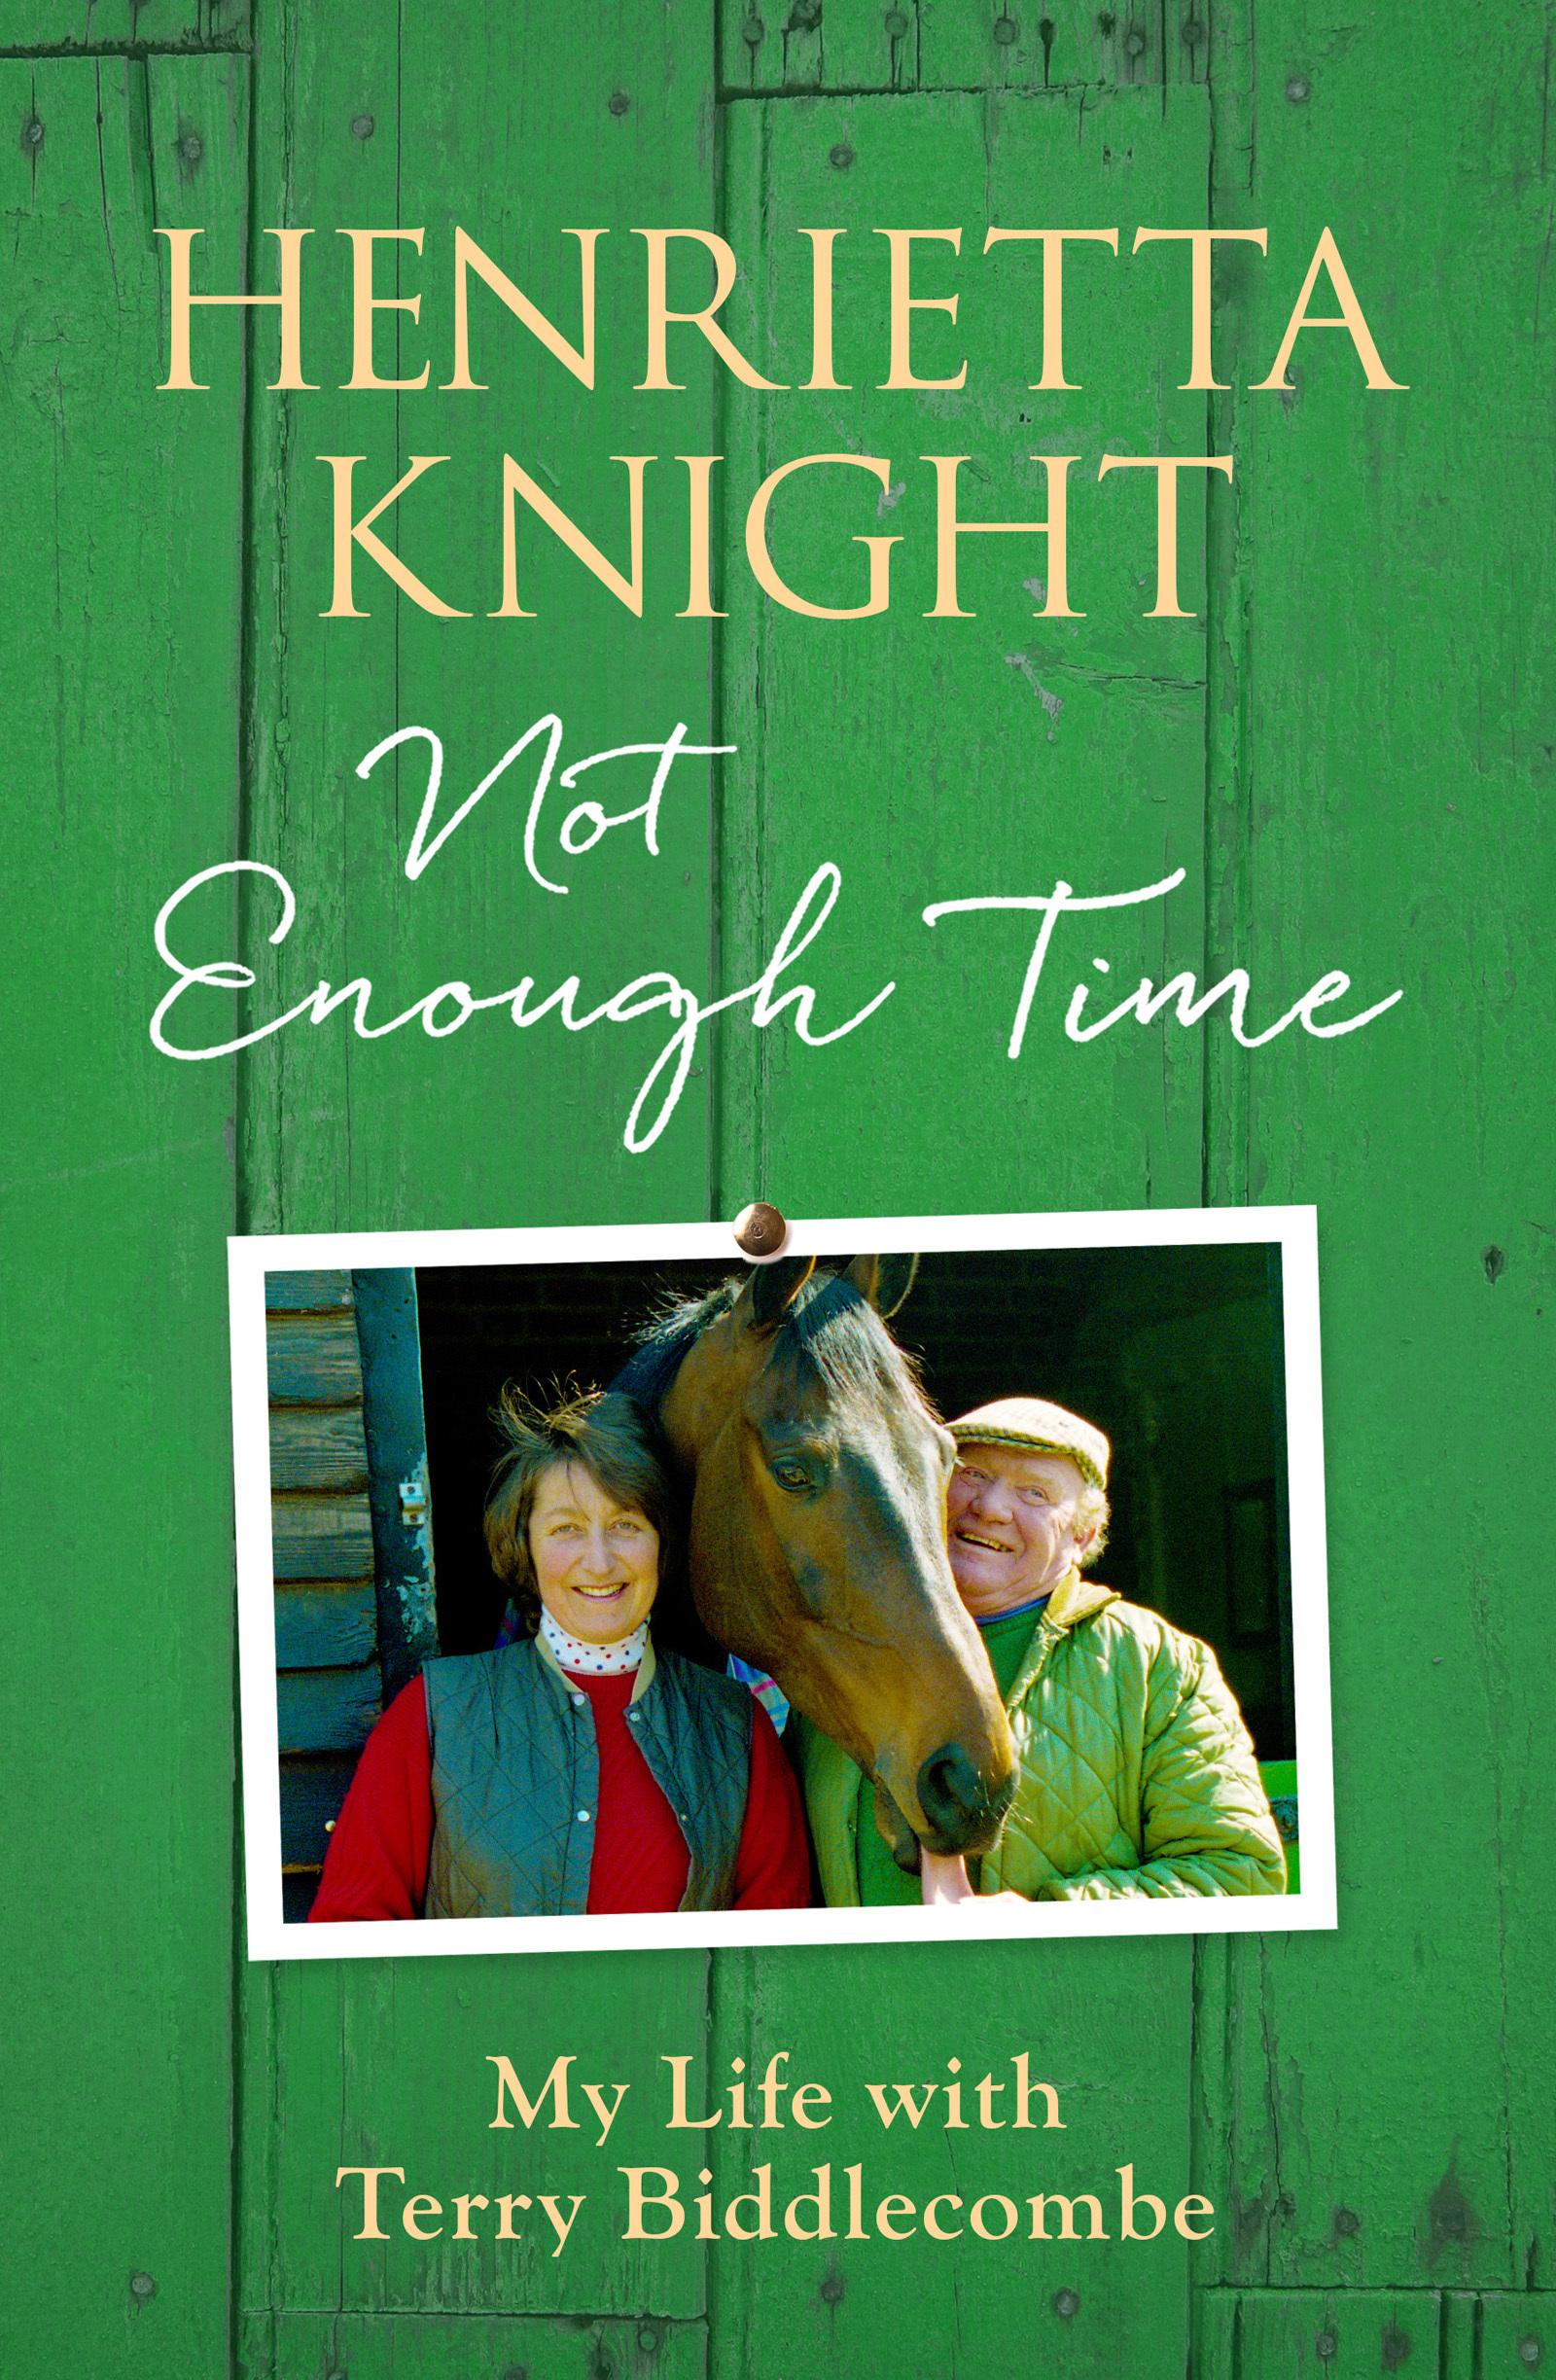 Not Enough Time Henrietta Knight